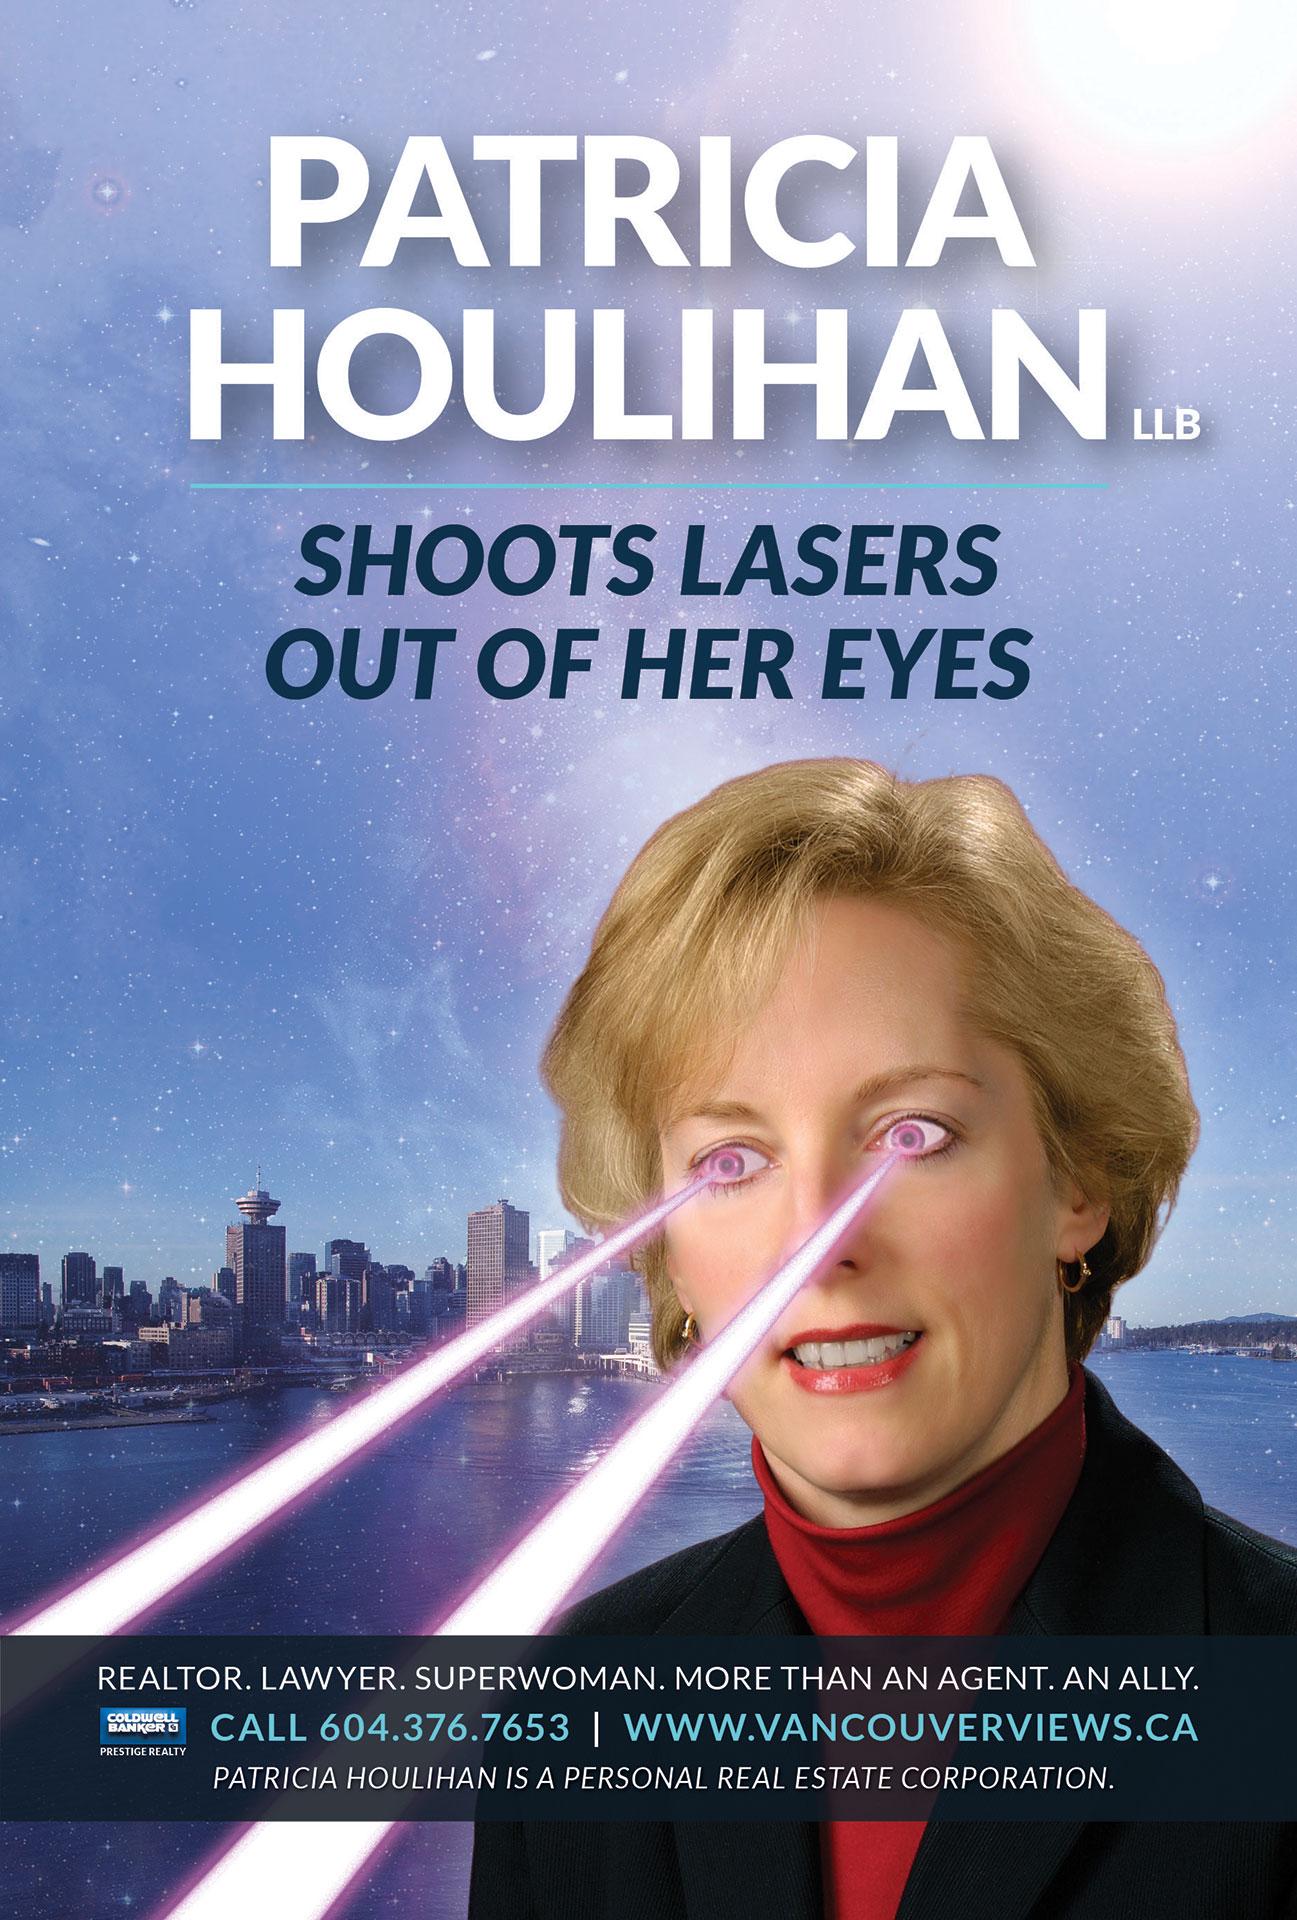 Patricia Houlihan REALTOR® Bus Shelter Ad